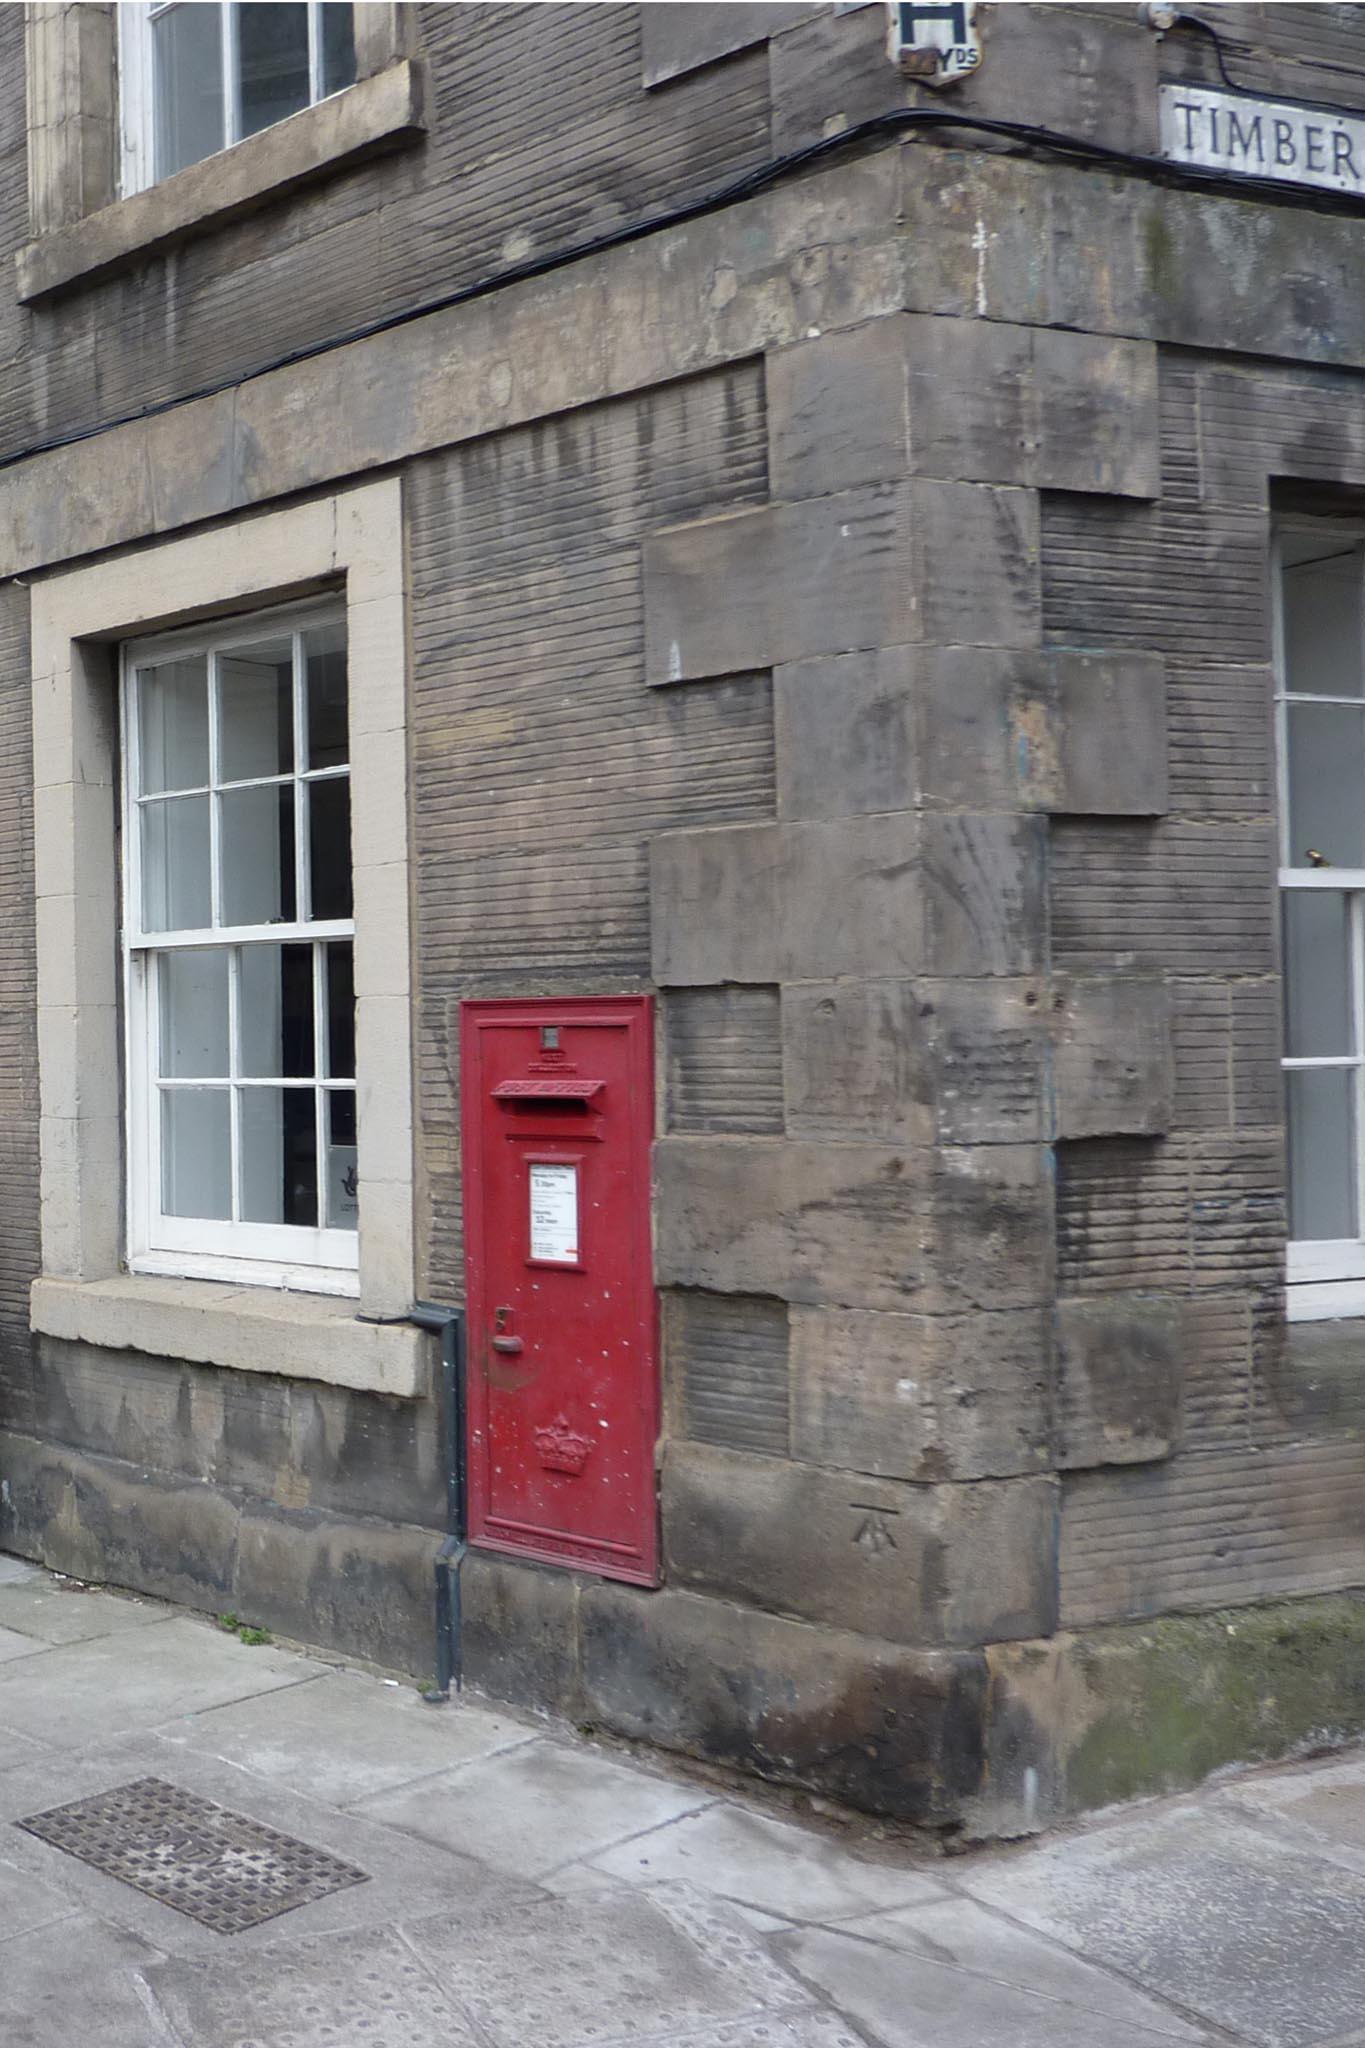 ER/Scottish Crown wall box, 1950s, Edinburgh. Andrew R Young